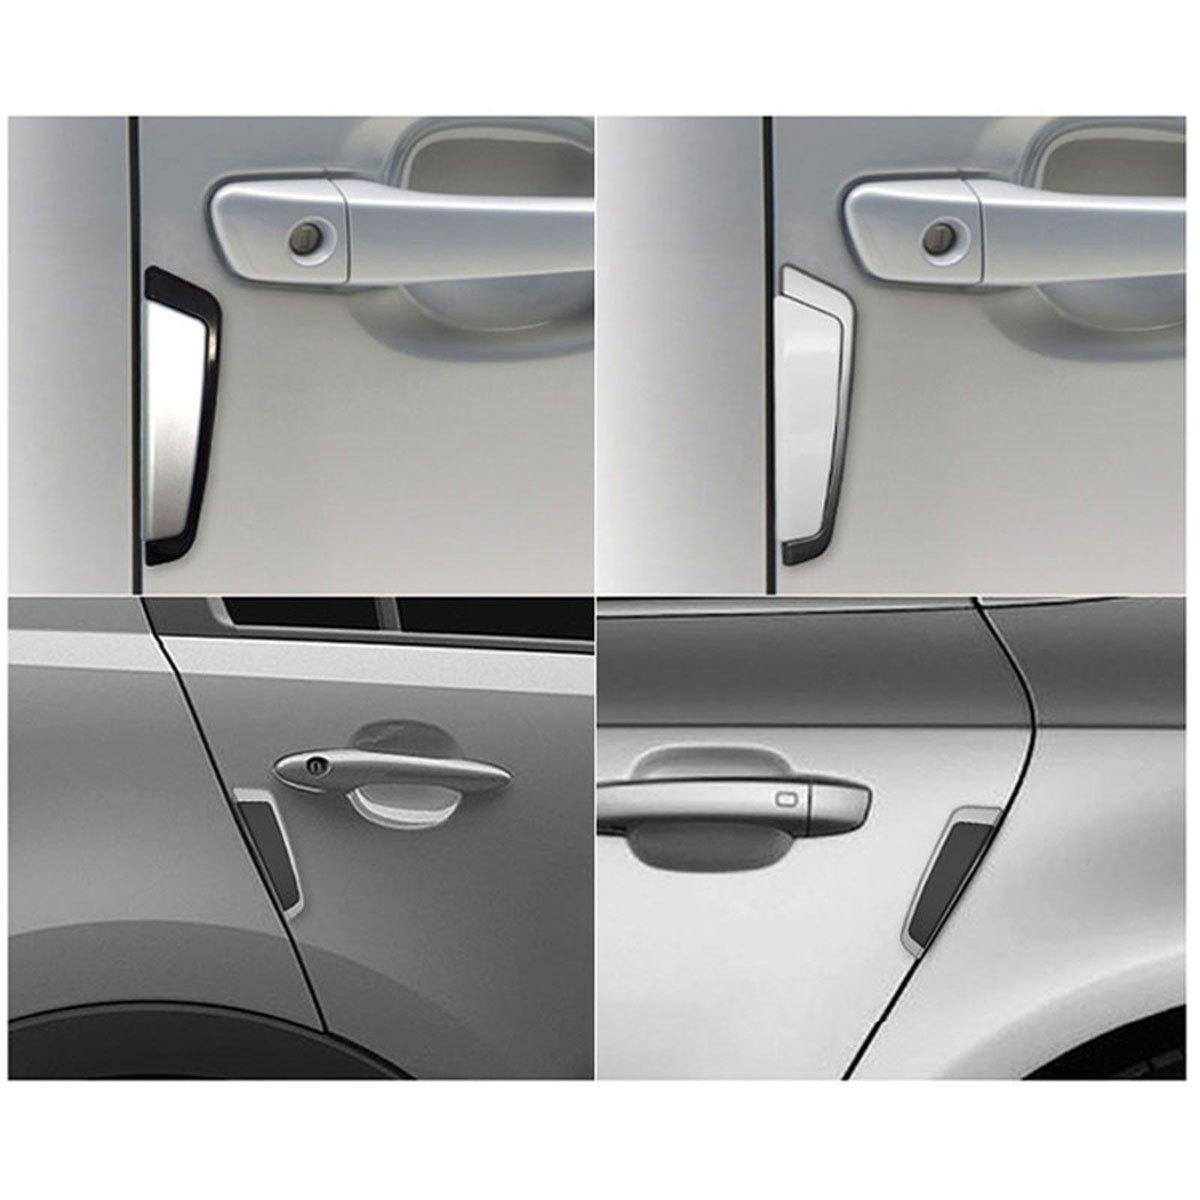 STATUS CAR Slim Soft Door Edge Guards Door Protector Guard Molding White x4Pcs